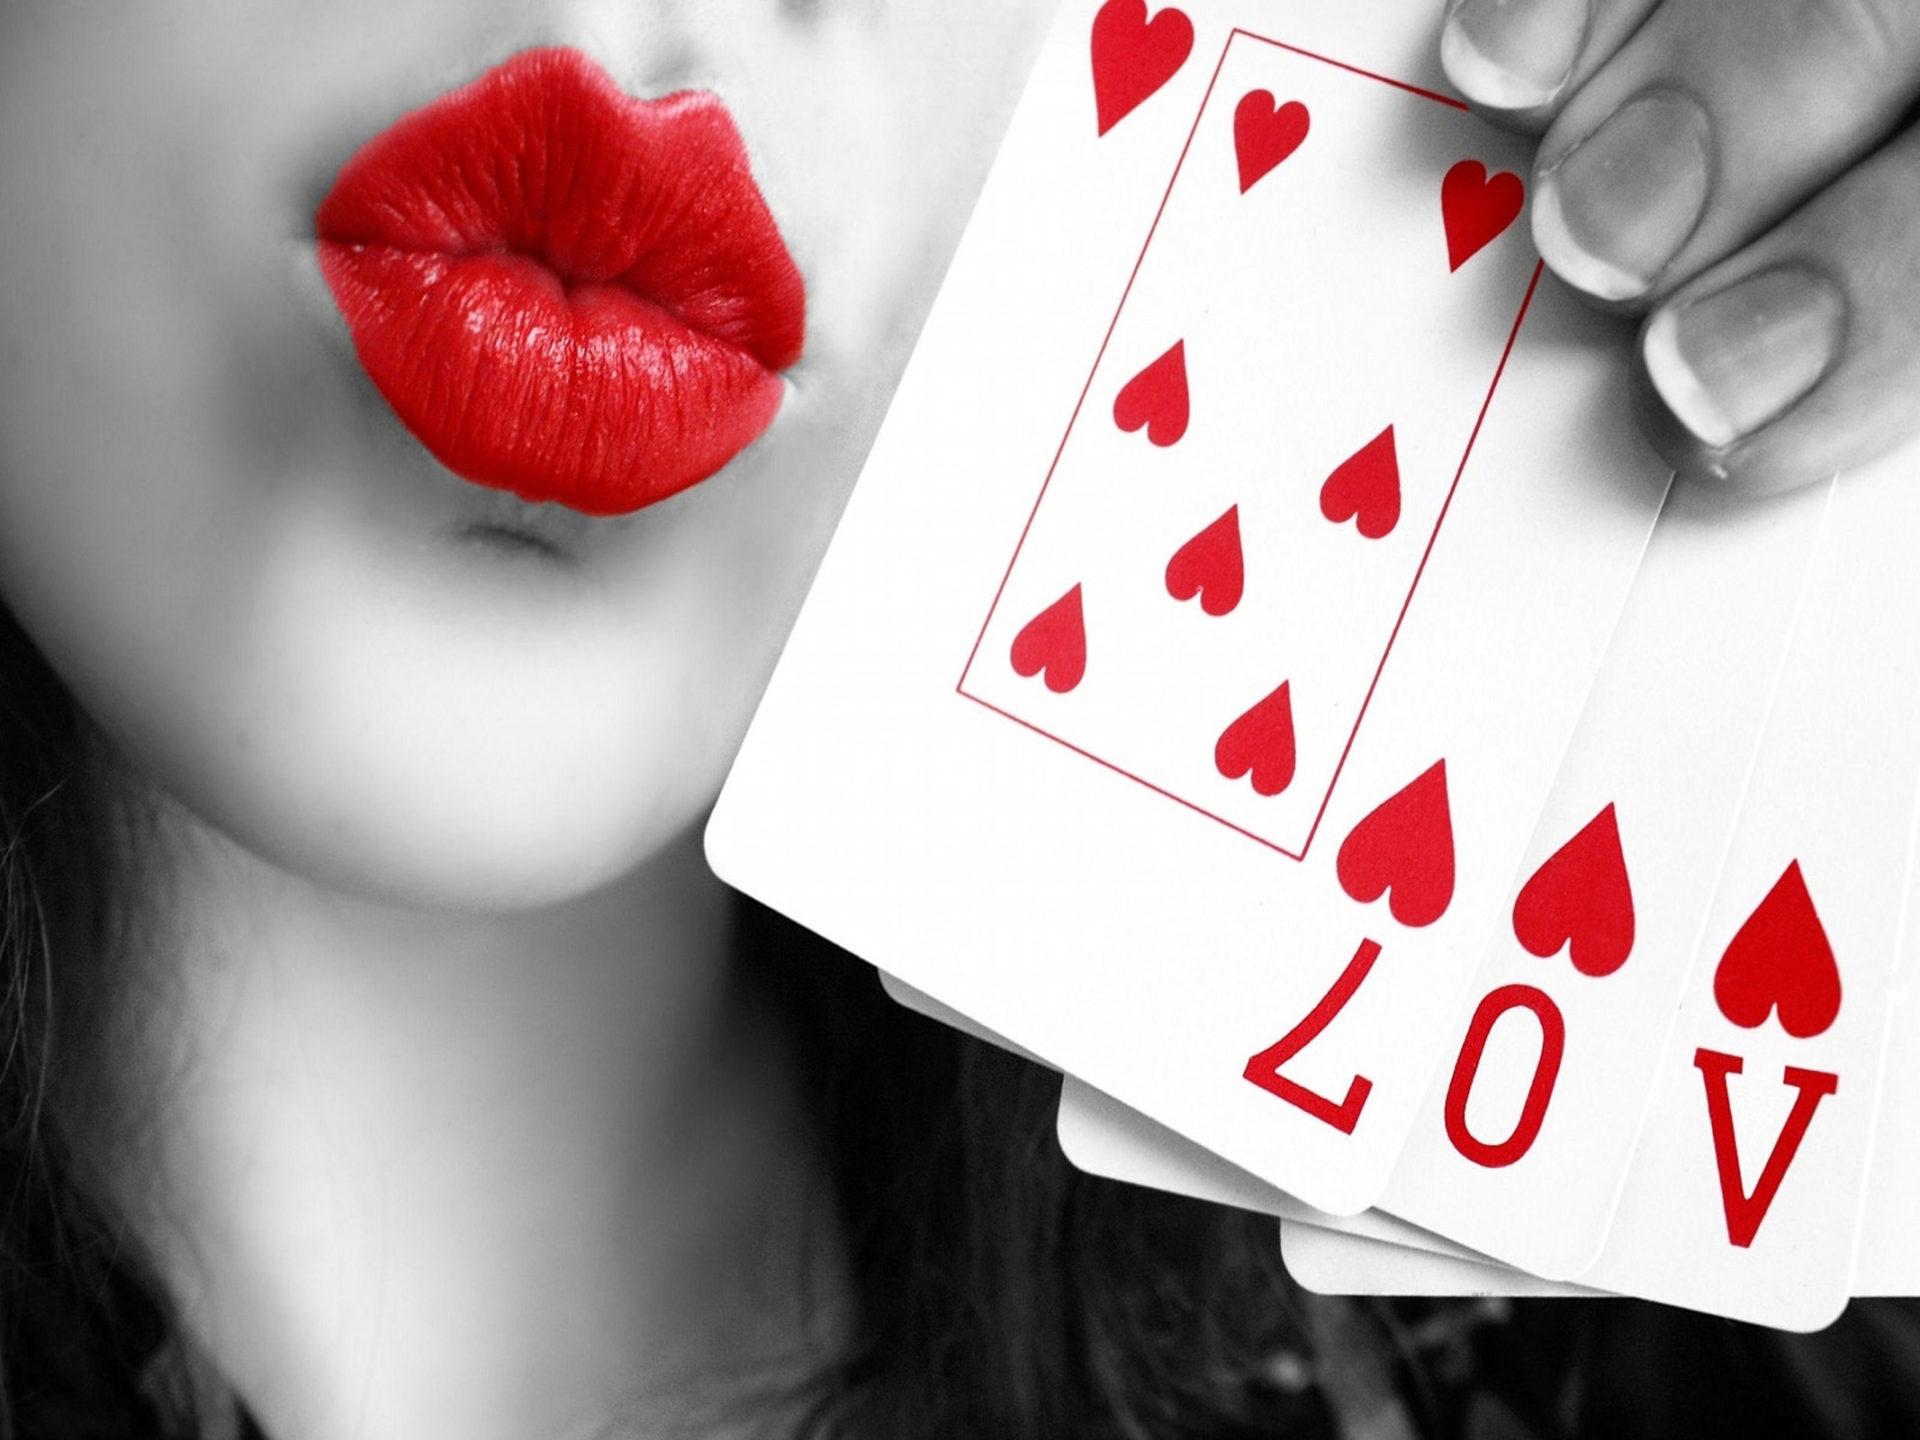 Cute Wallpapers Romance Love U Kiss U Images Free Download Wallpapers13 Com